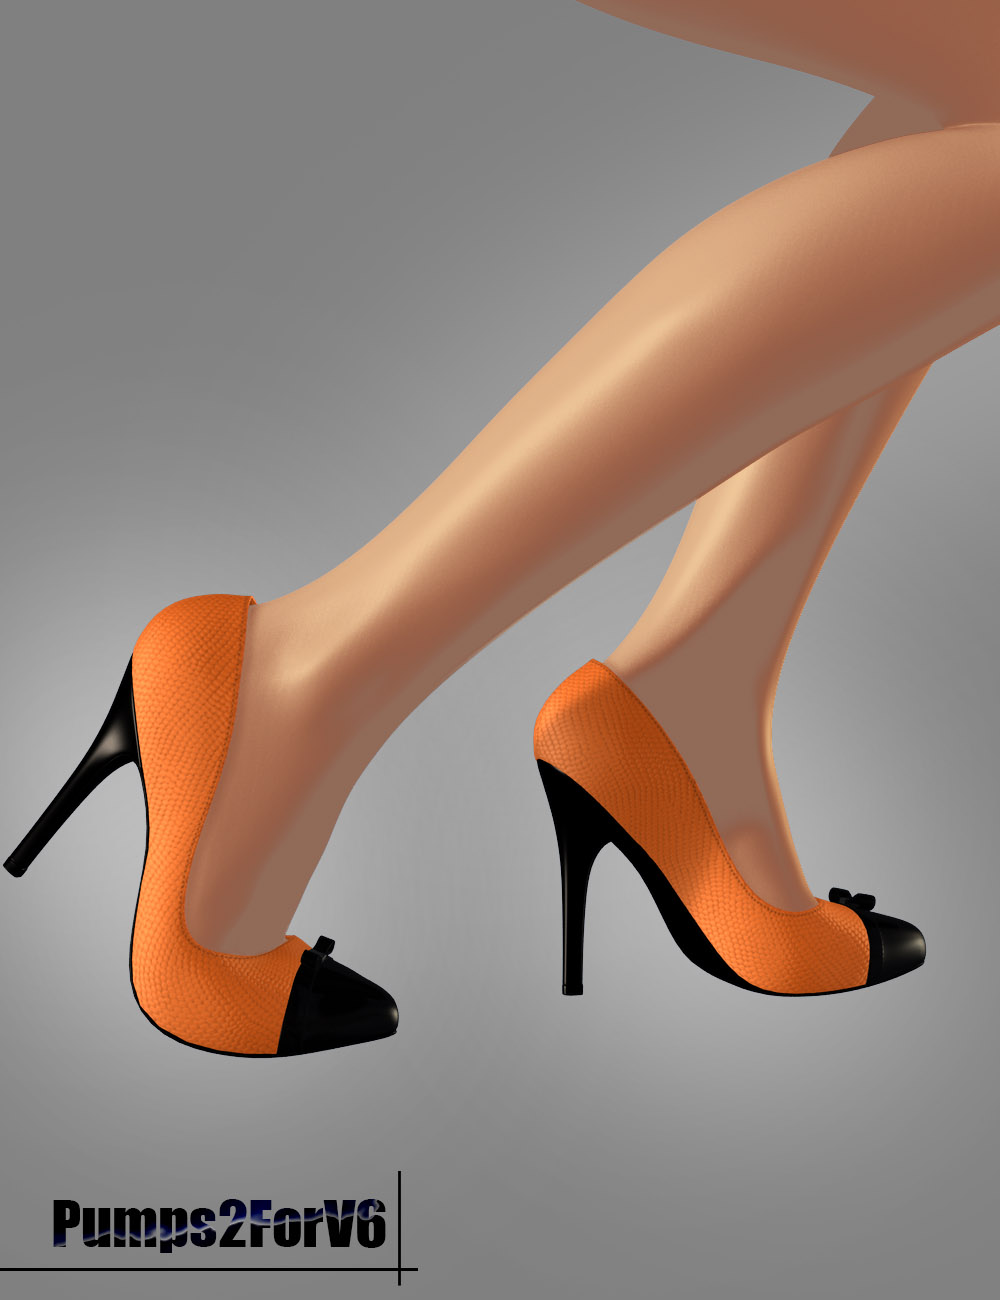 Pumps 2 for Victoria 6 by: dx30, 3D Models by Daz 3D